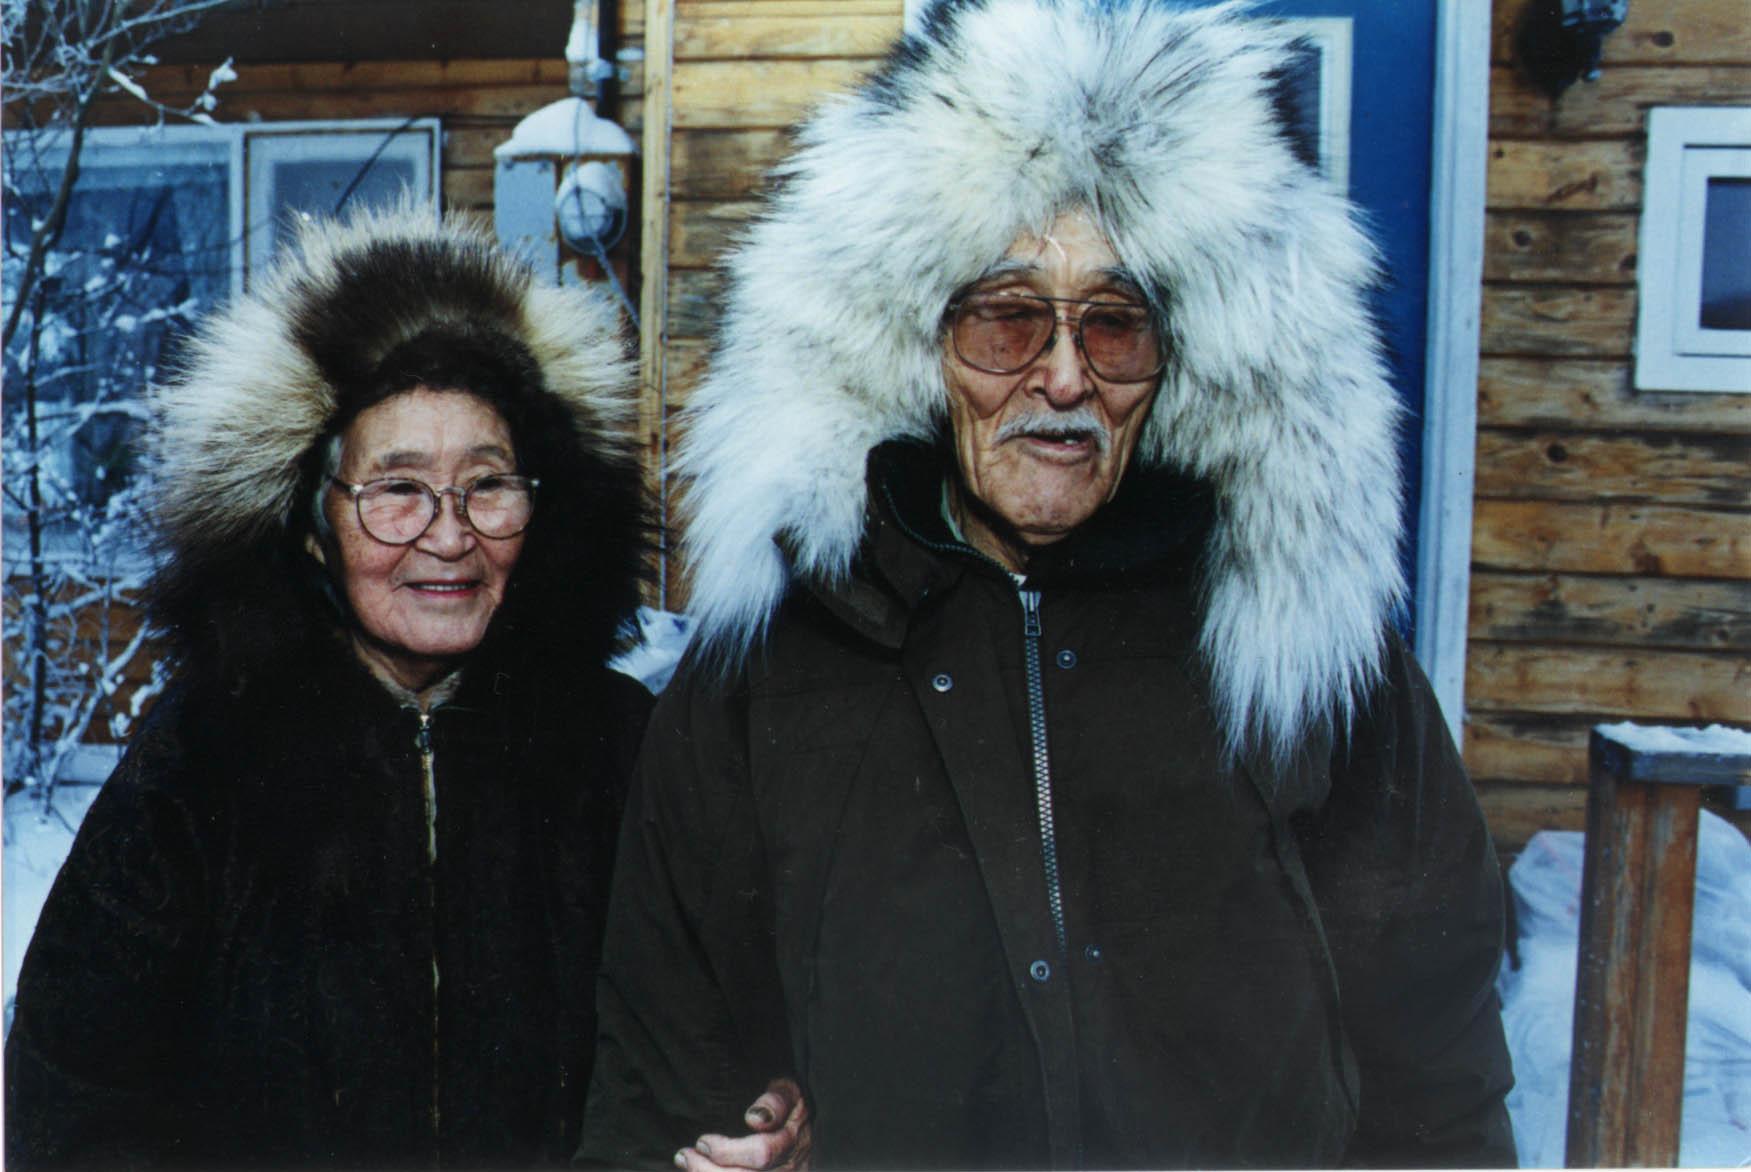 image of elderly couple